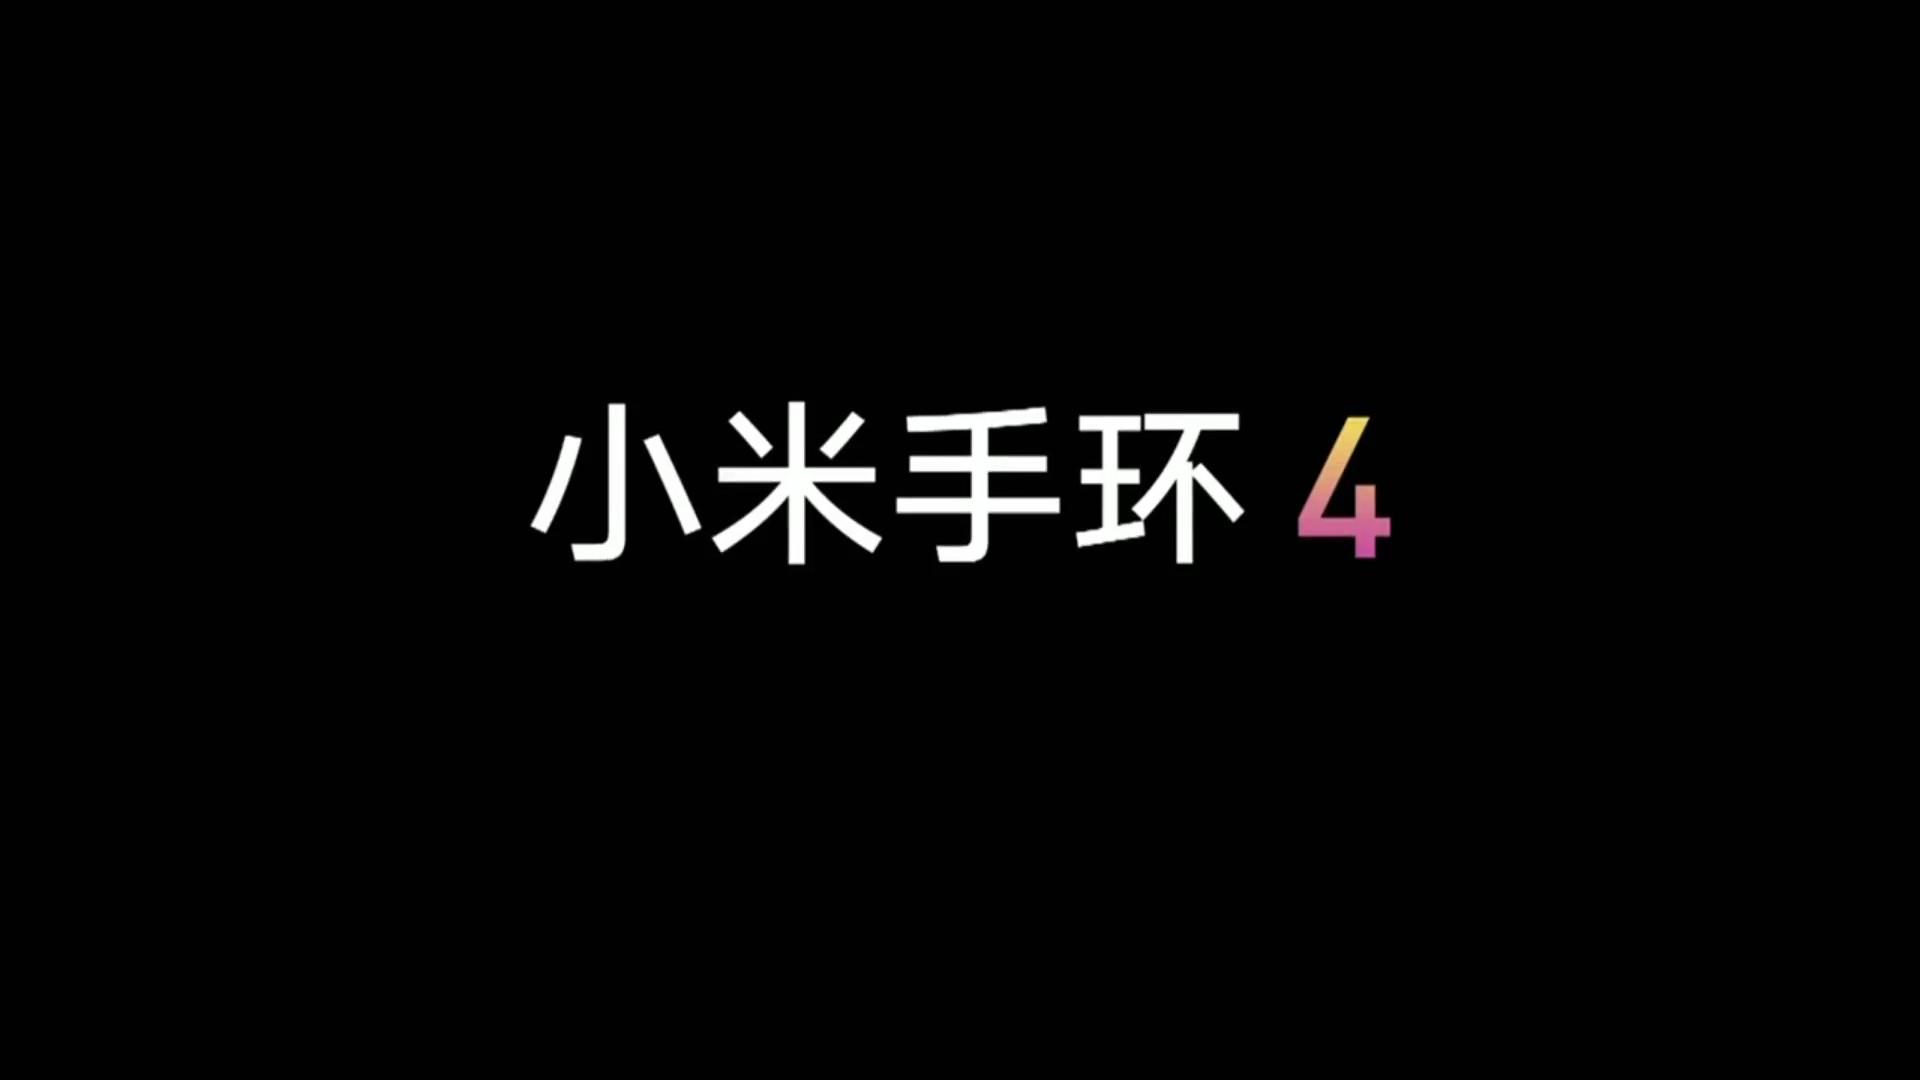 2019-06-11 14-01-42_Moment